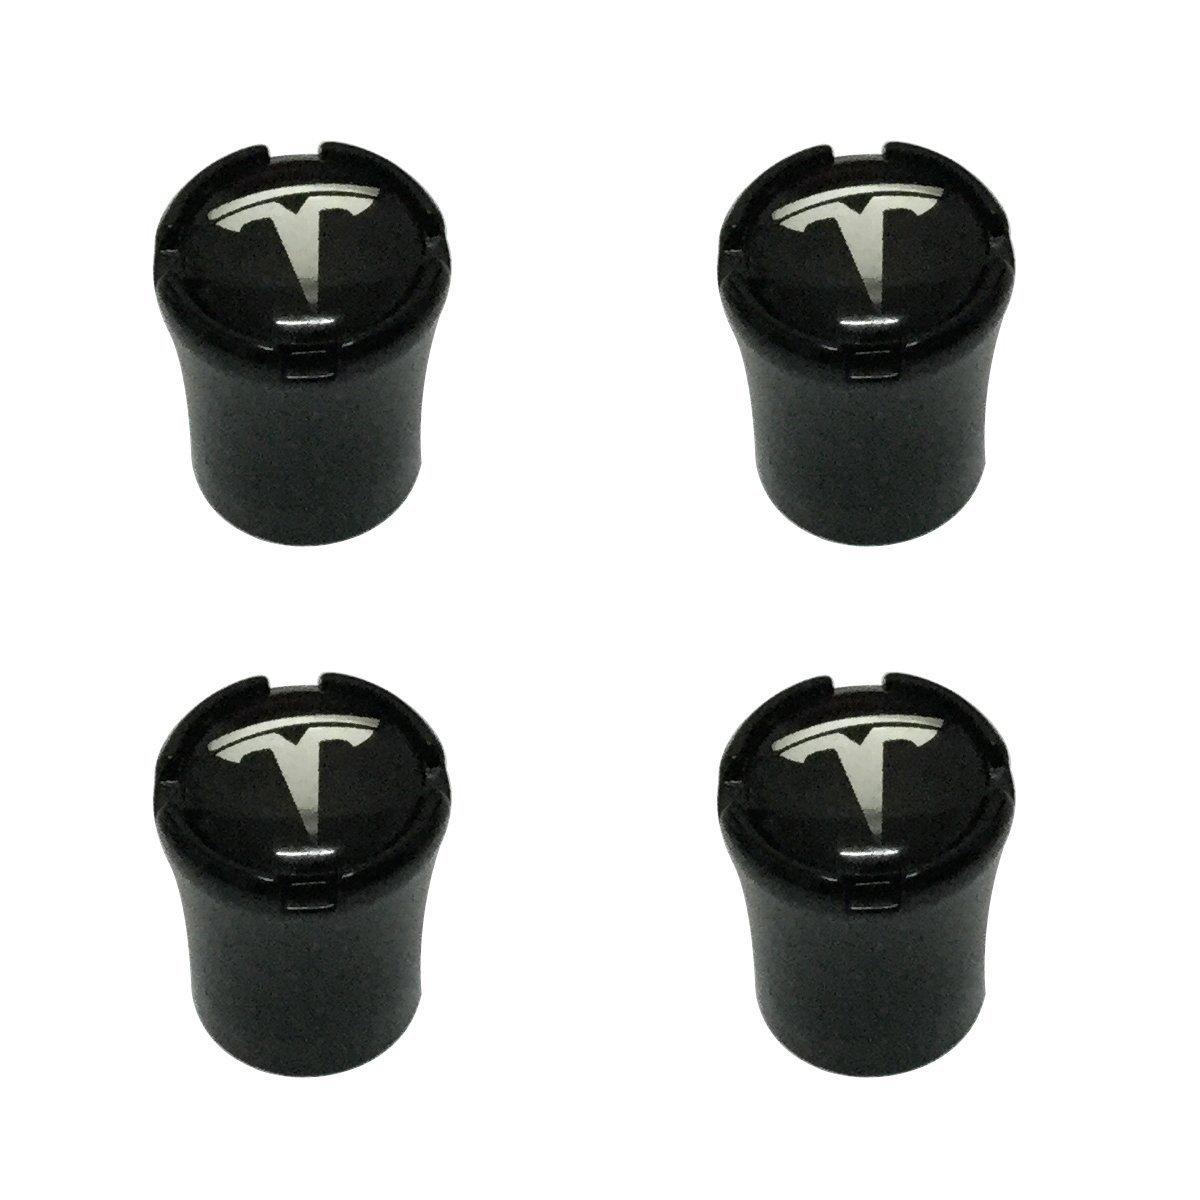 New USA Fast Ship 4pcs Black Color Car Dustproof Caps Tire Wheel Stem Air Valve Caps Cover Car Accessories Compatible Fit For Electric Sedan SUV Car Design (TESLA) Tampa